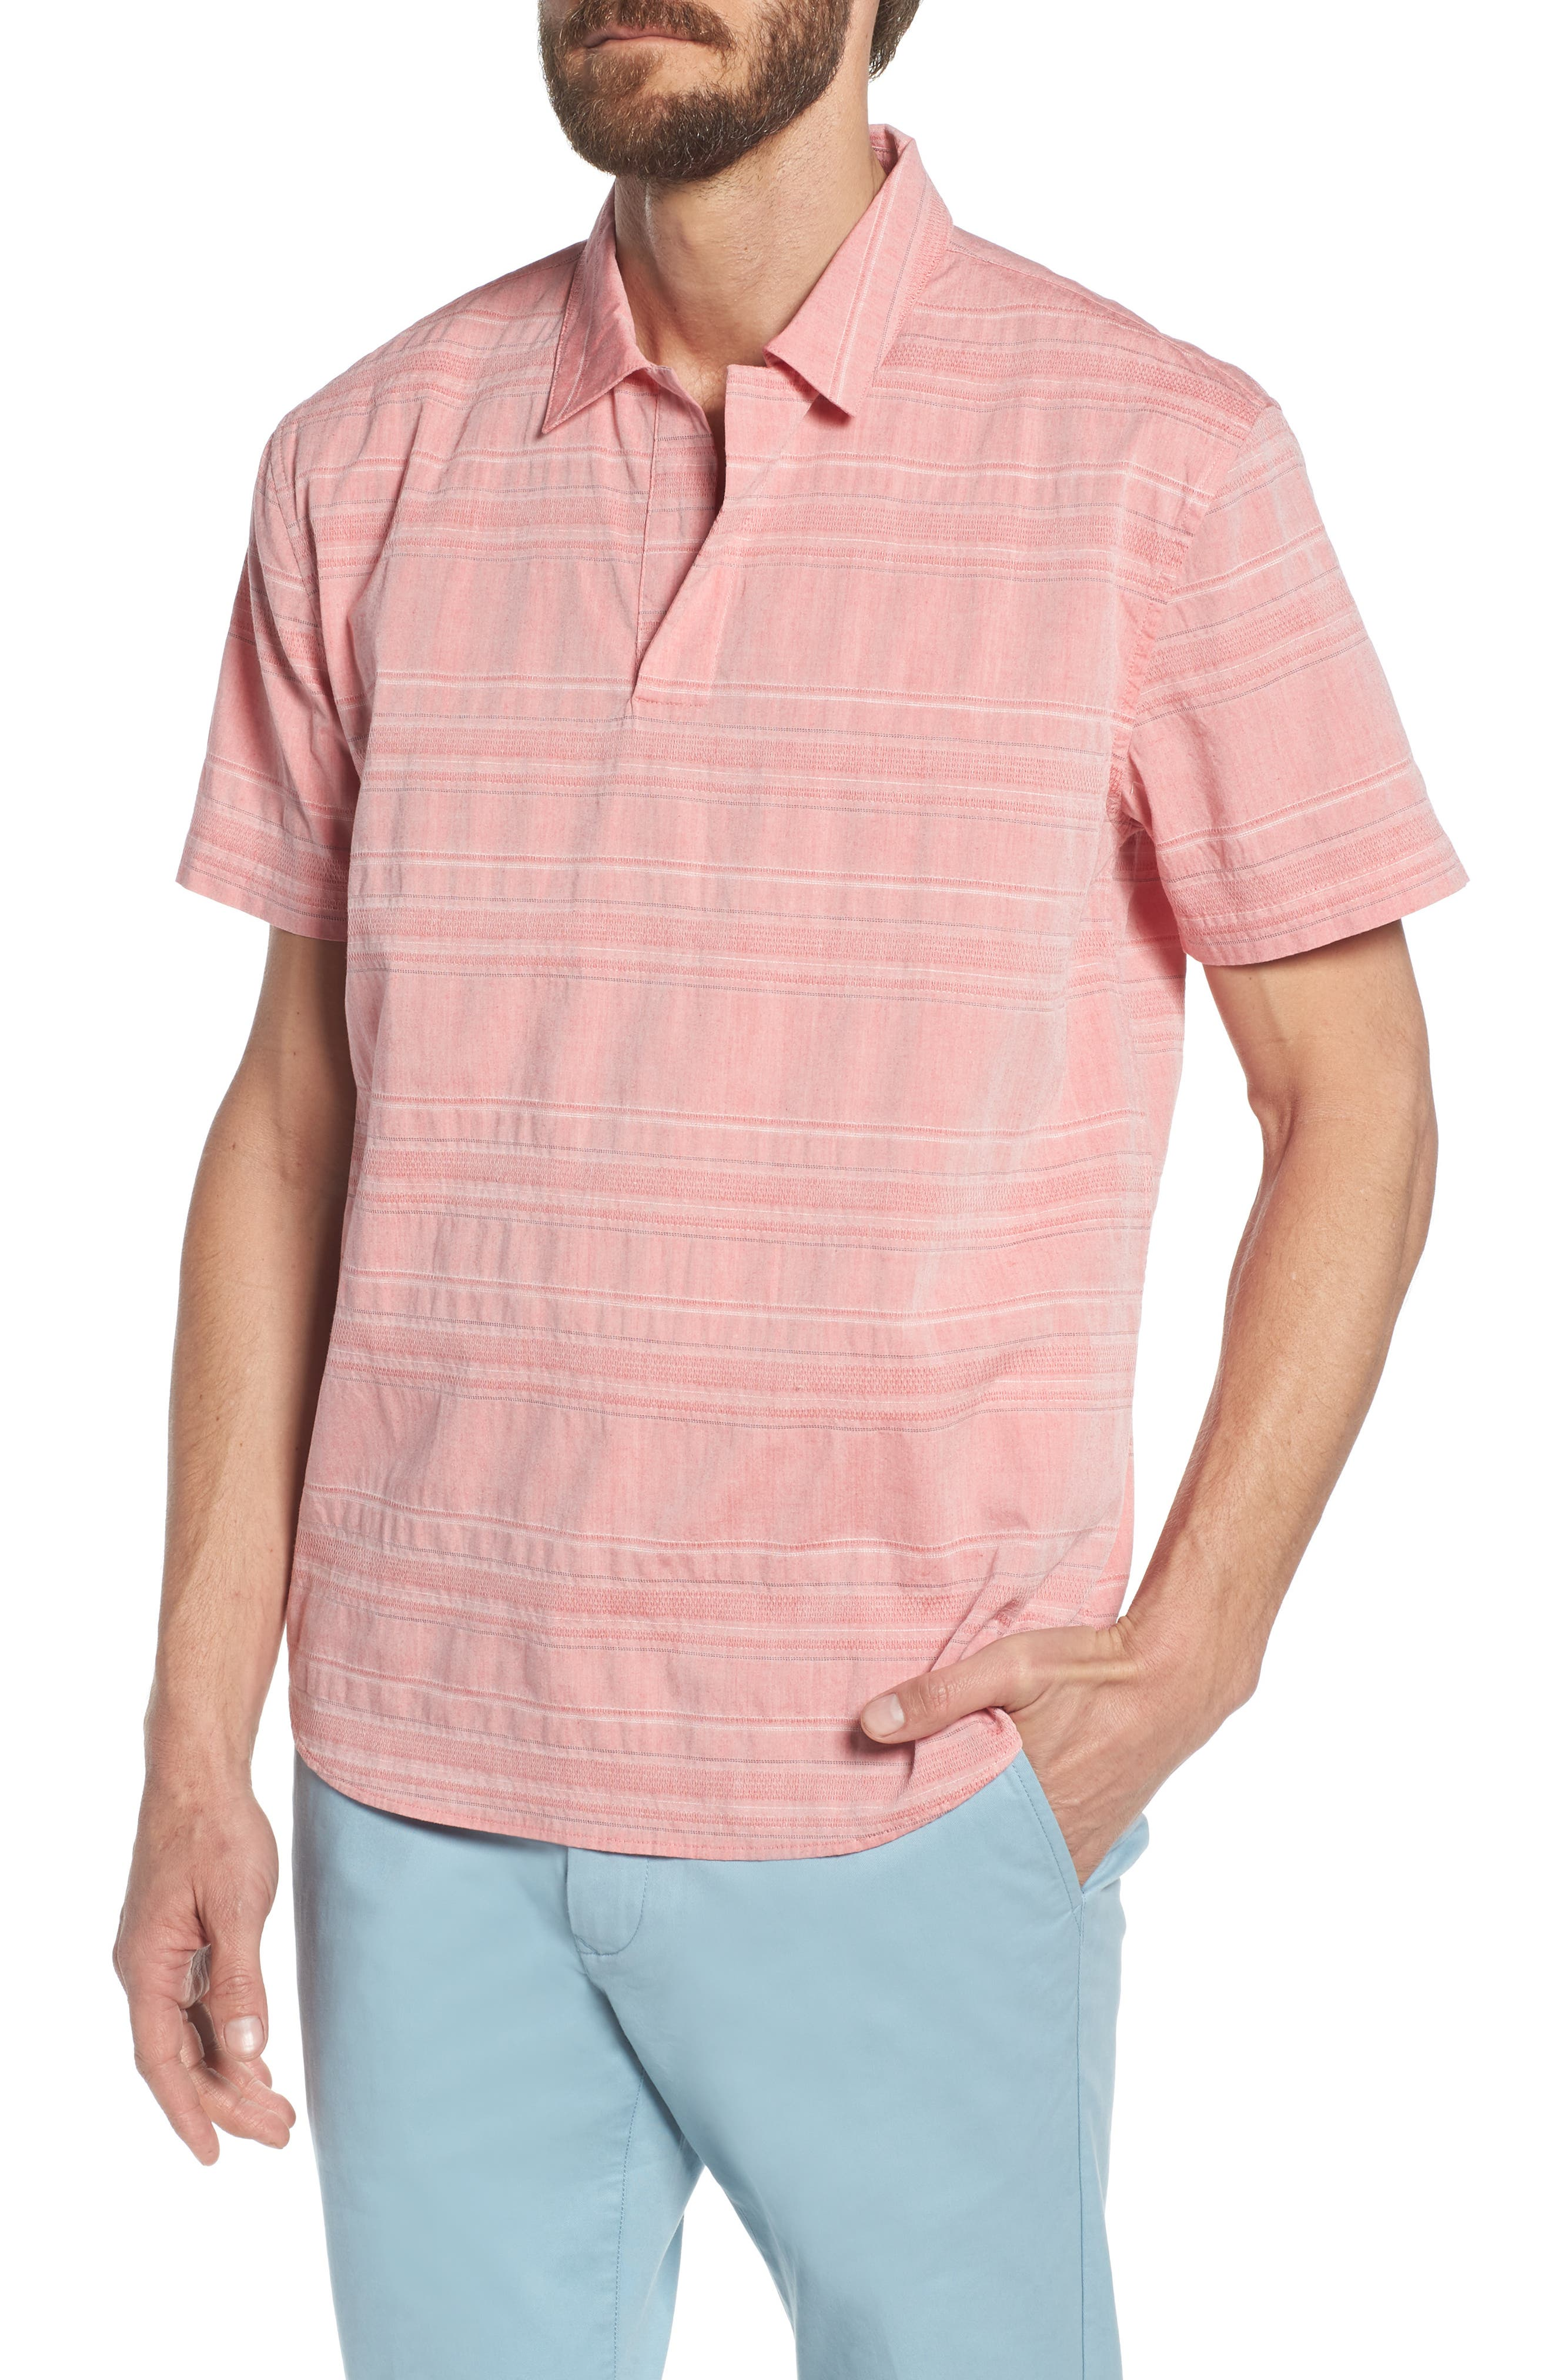 Beach Slim Fit Stripe Polo,                         Main,                         color, Katama Awning - Faded Adobe